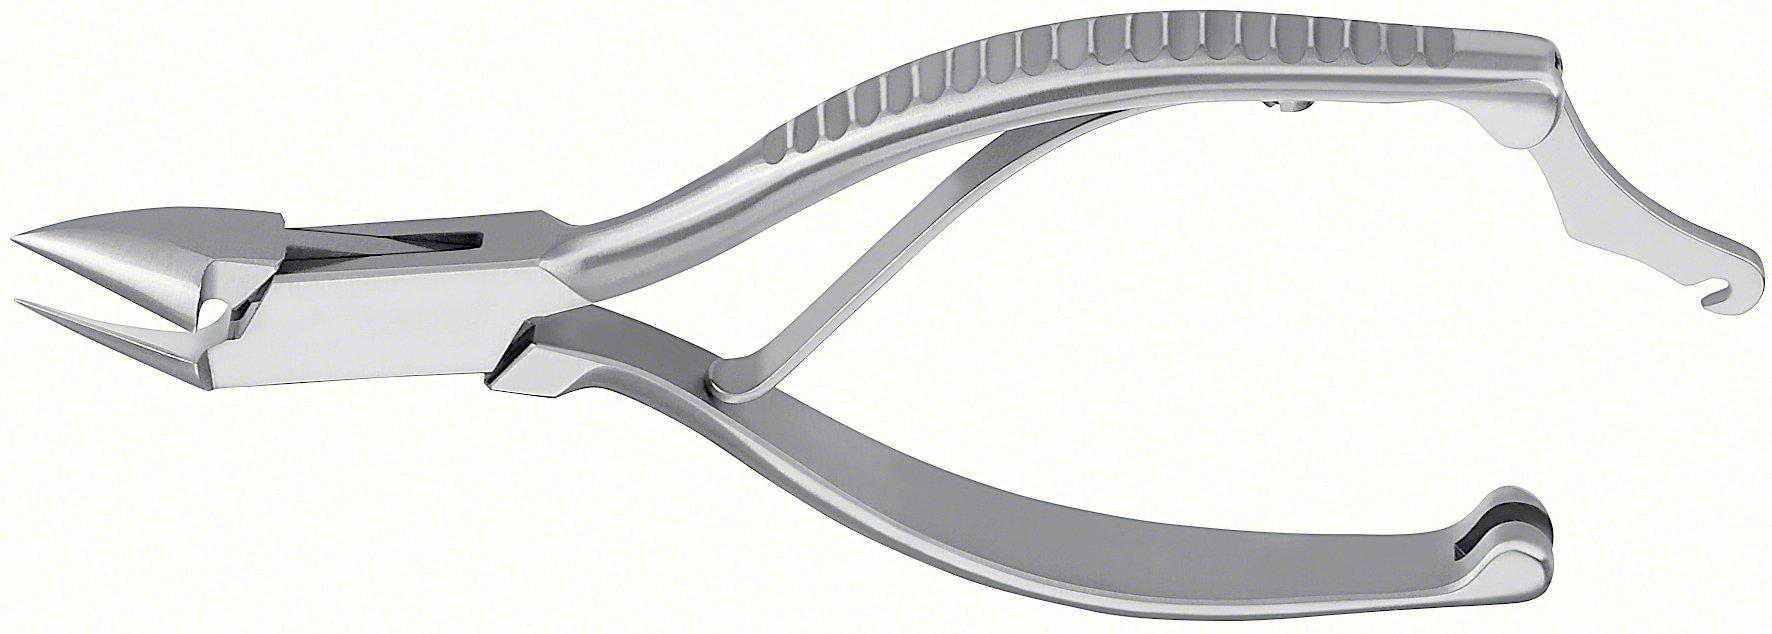 Aesculap HF223R Nail Nipper Forceps, Straight Cutting Edge, 5-1/8, OR Grade